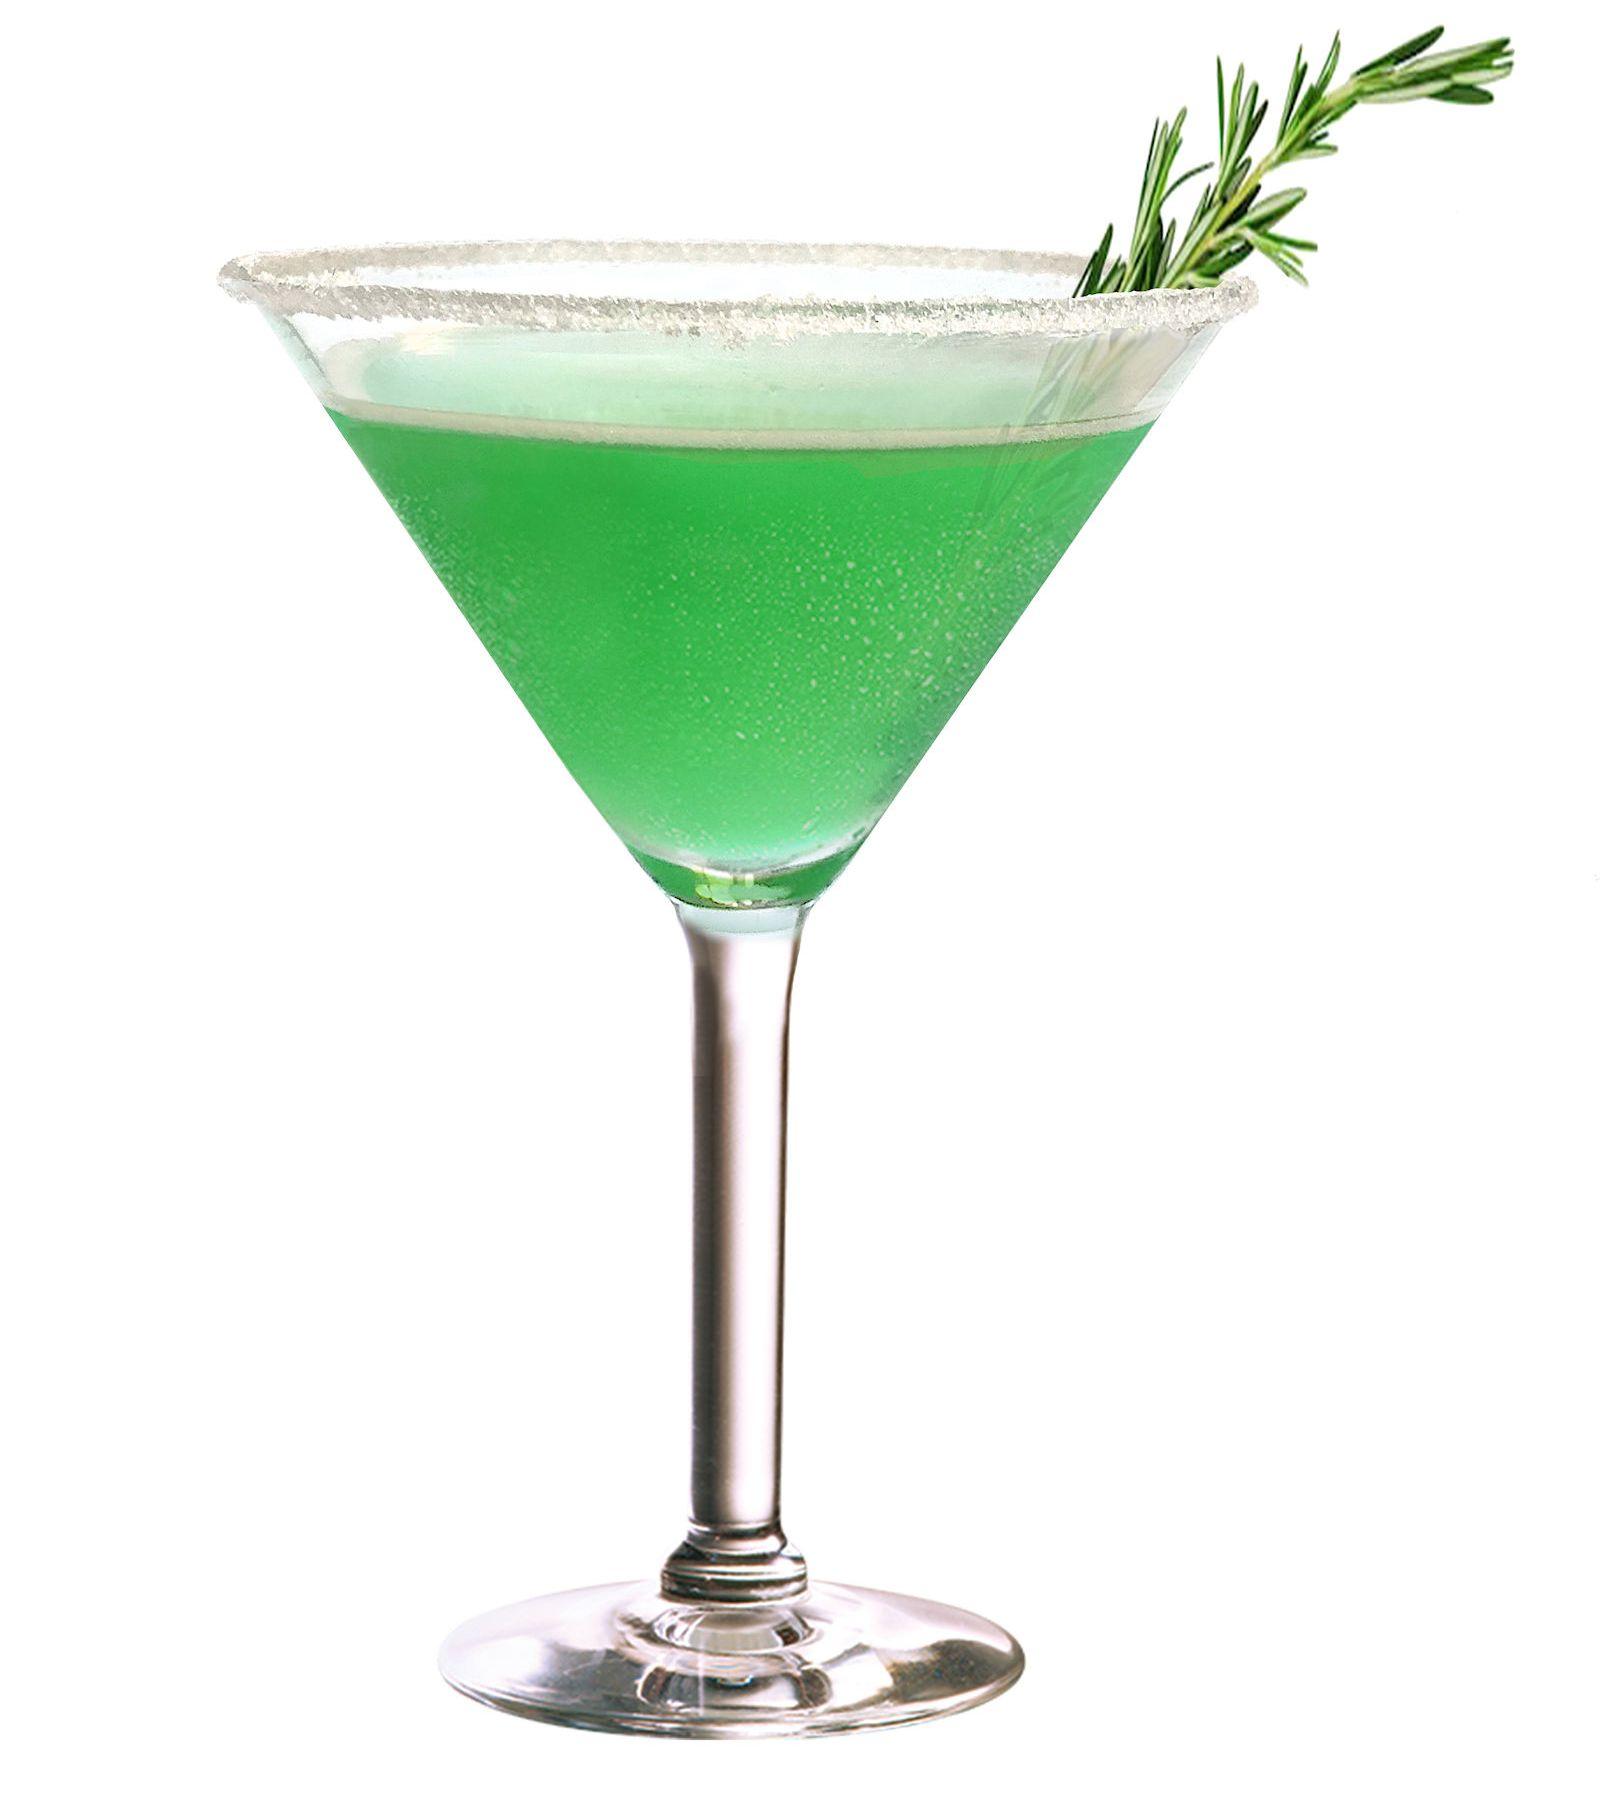 Bennigan's is Making Spirits Bright with Its New Festive Drink Menu